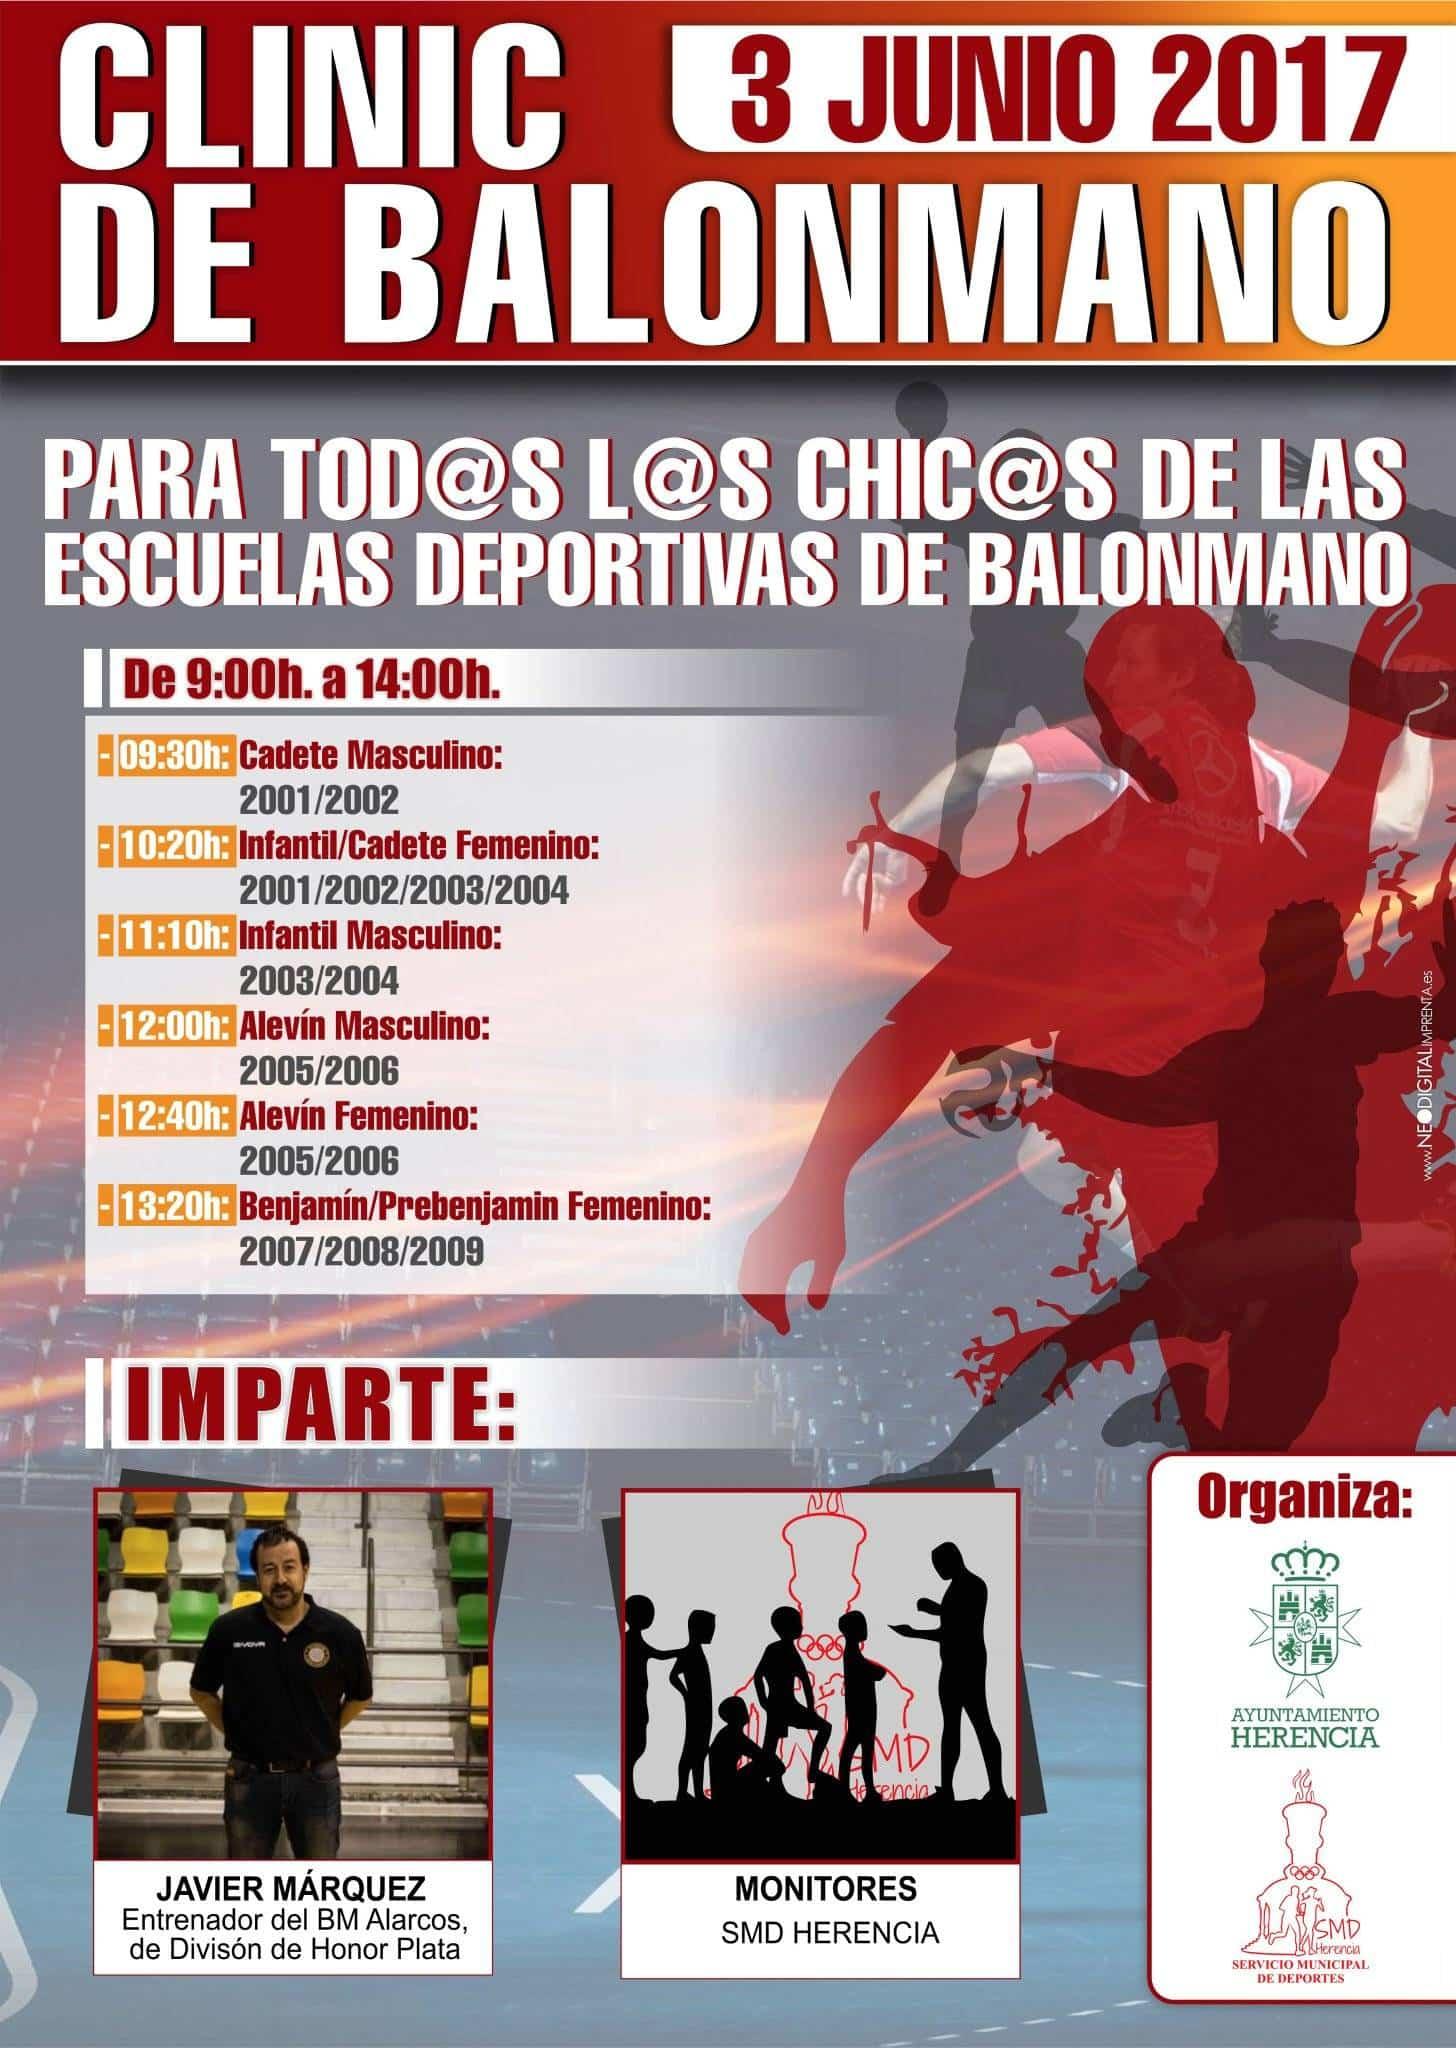 clinic de balonmano herencia - Clinic de Balonmano en Herencia